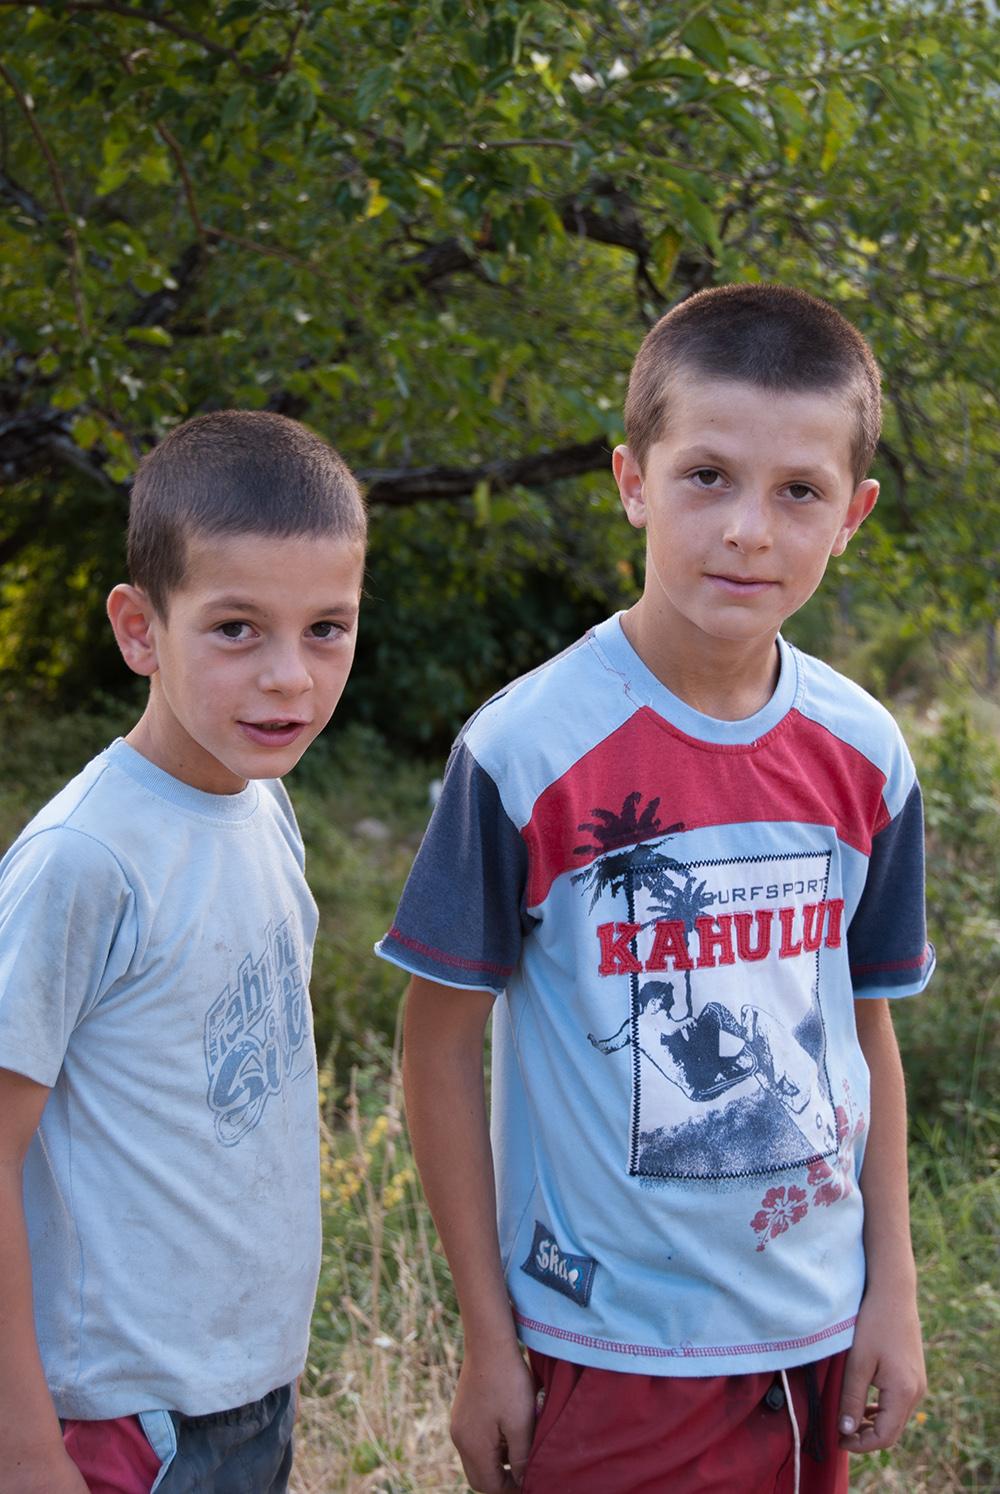 Portrait of two Boys, Orosh Mirditë, © alketa misja photography 2008